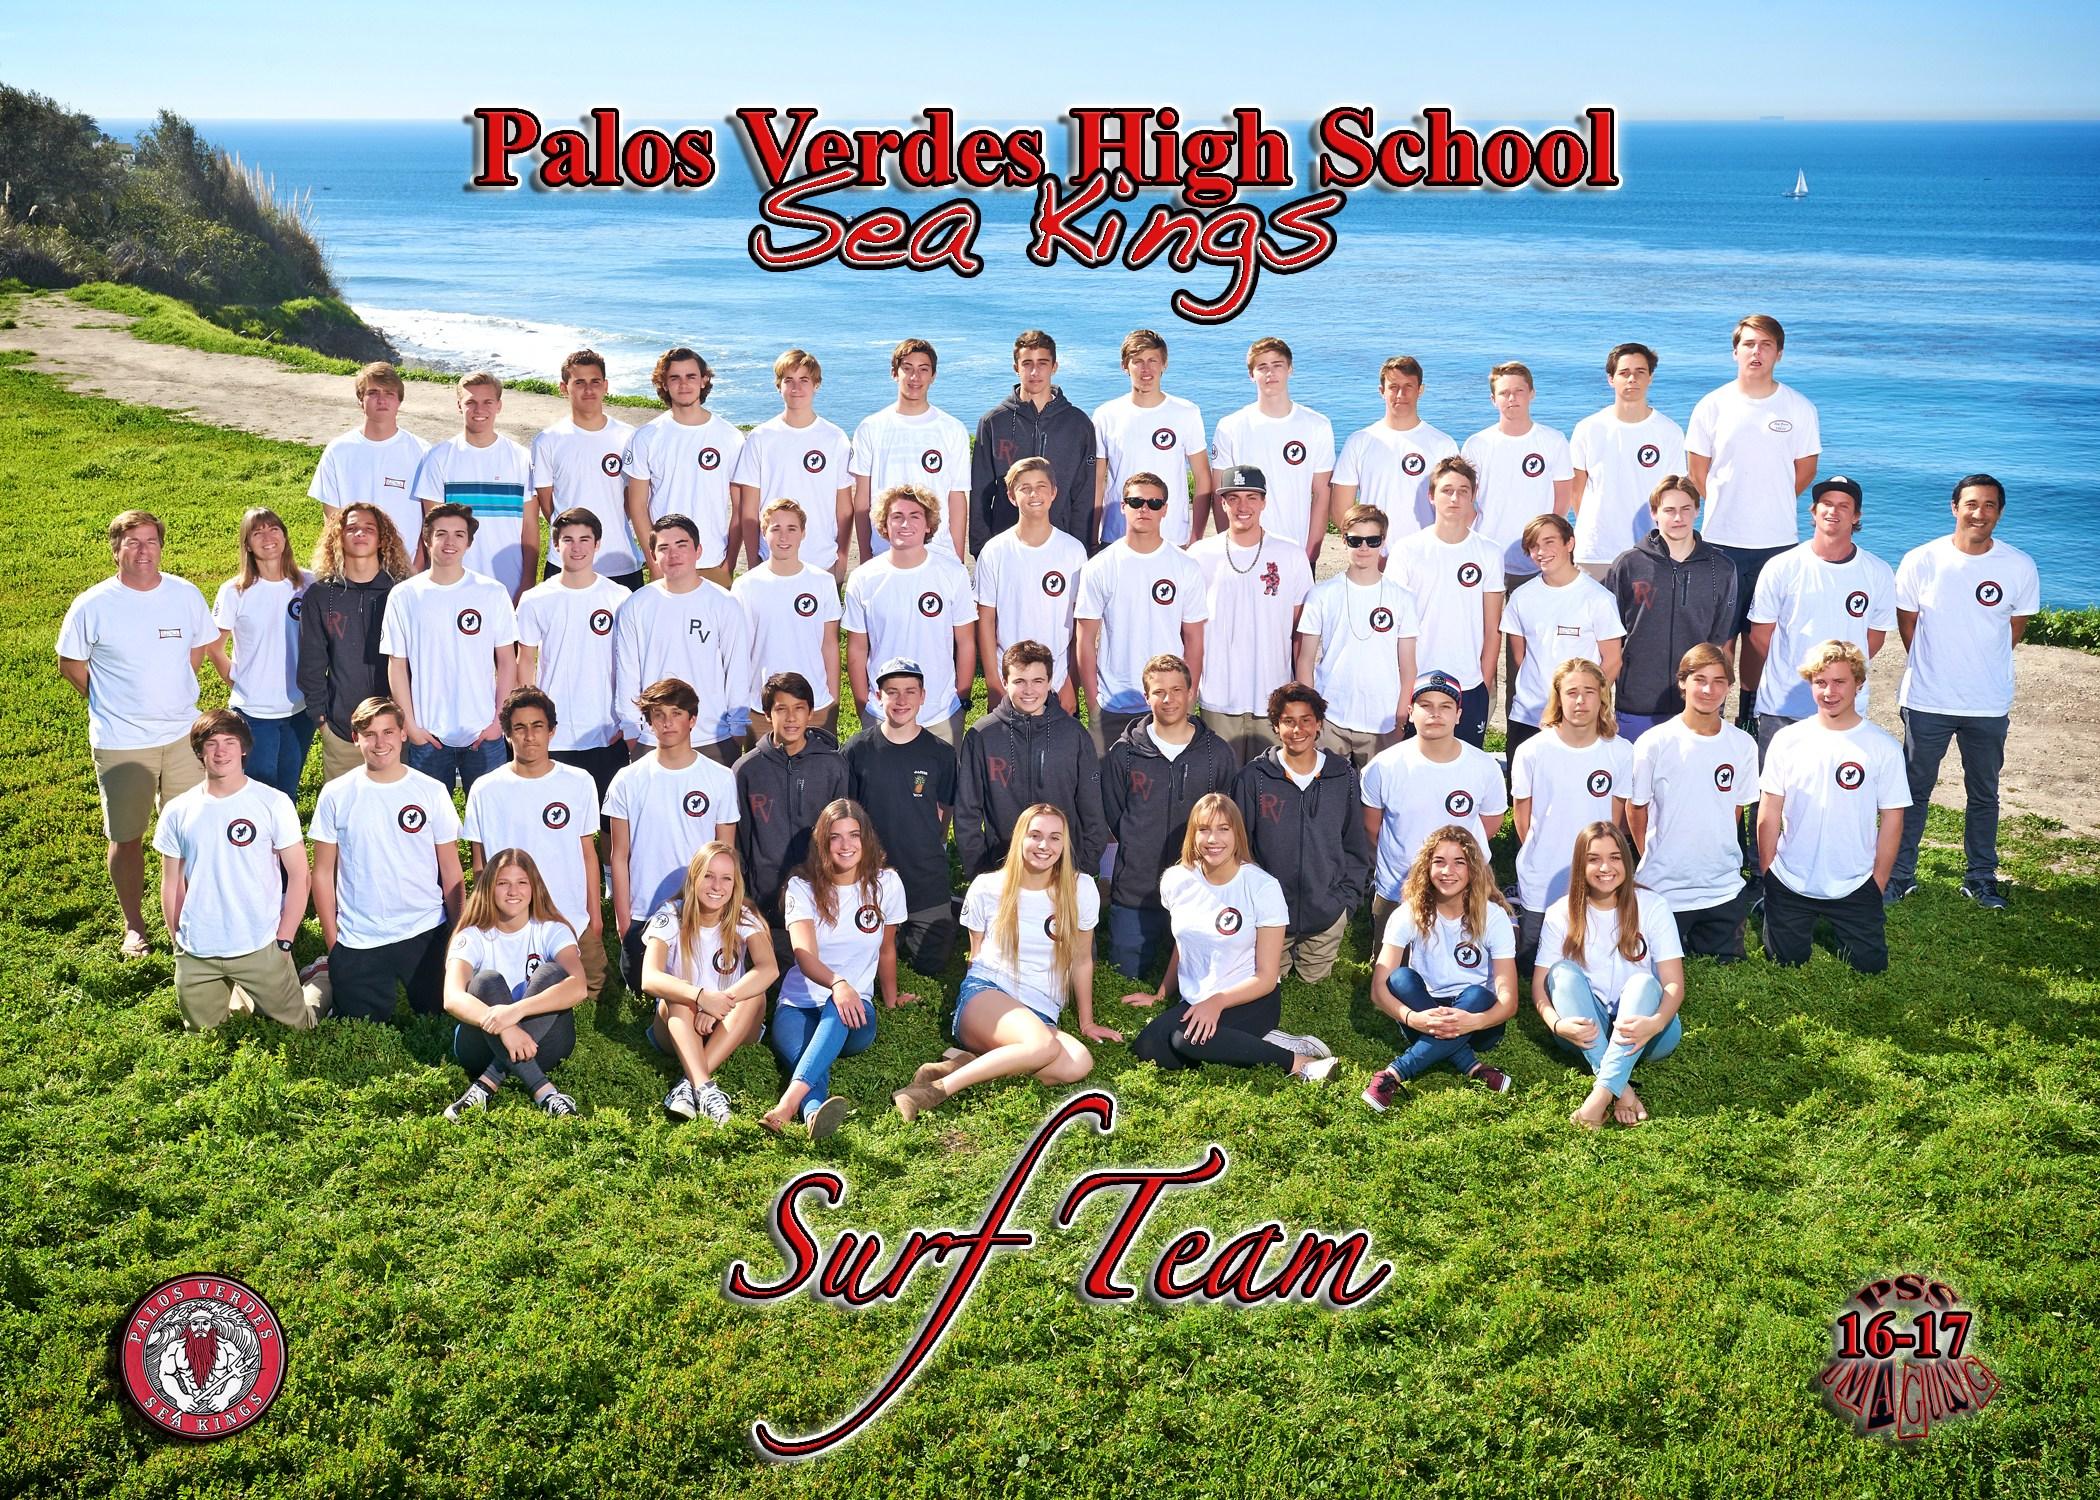 PVHS Surf Team photo